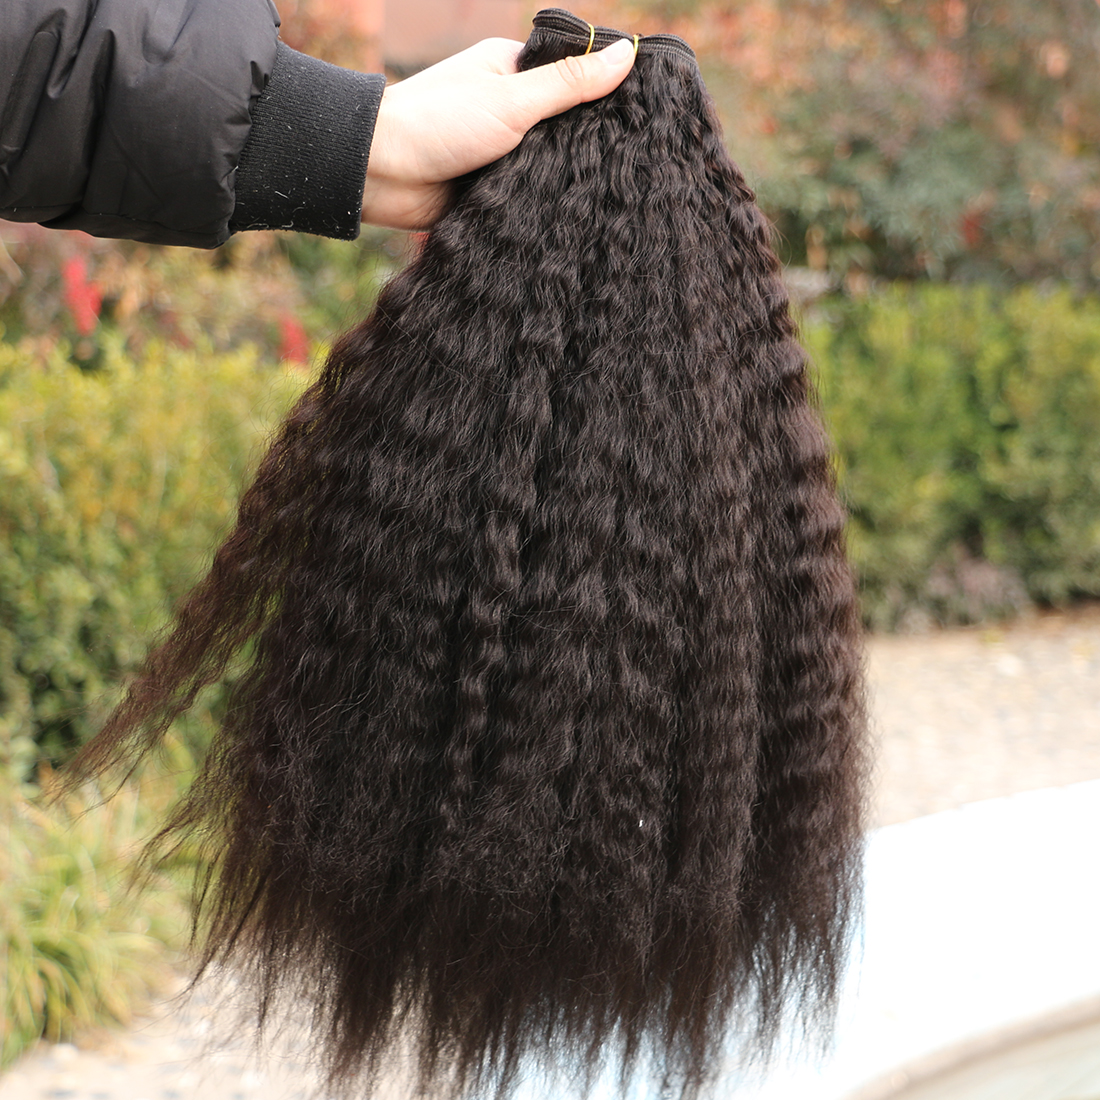 Fsr 3 unidades pacote kinky cabelo reto